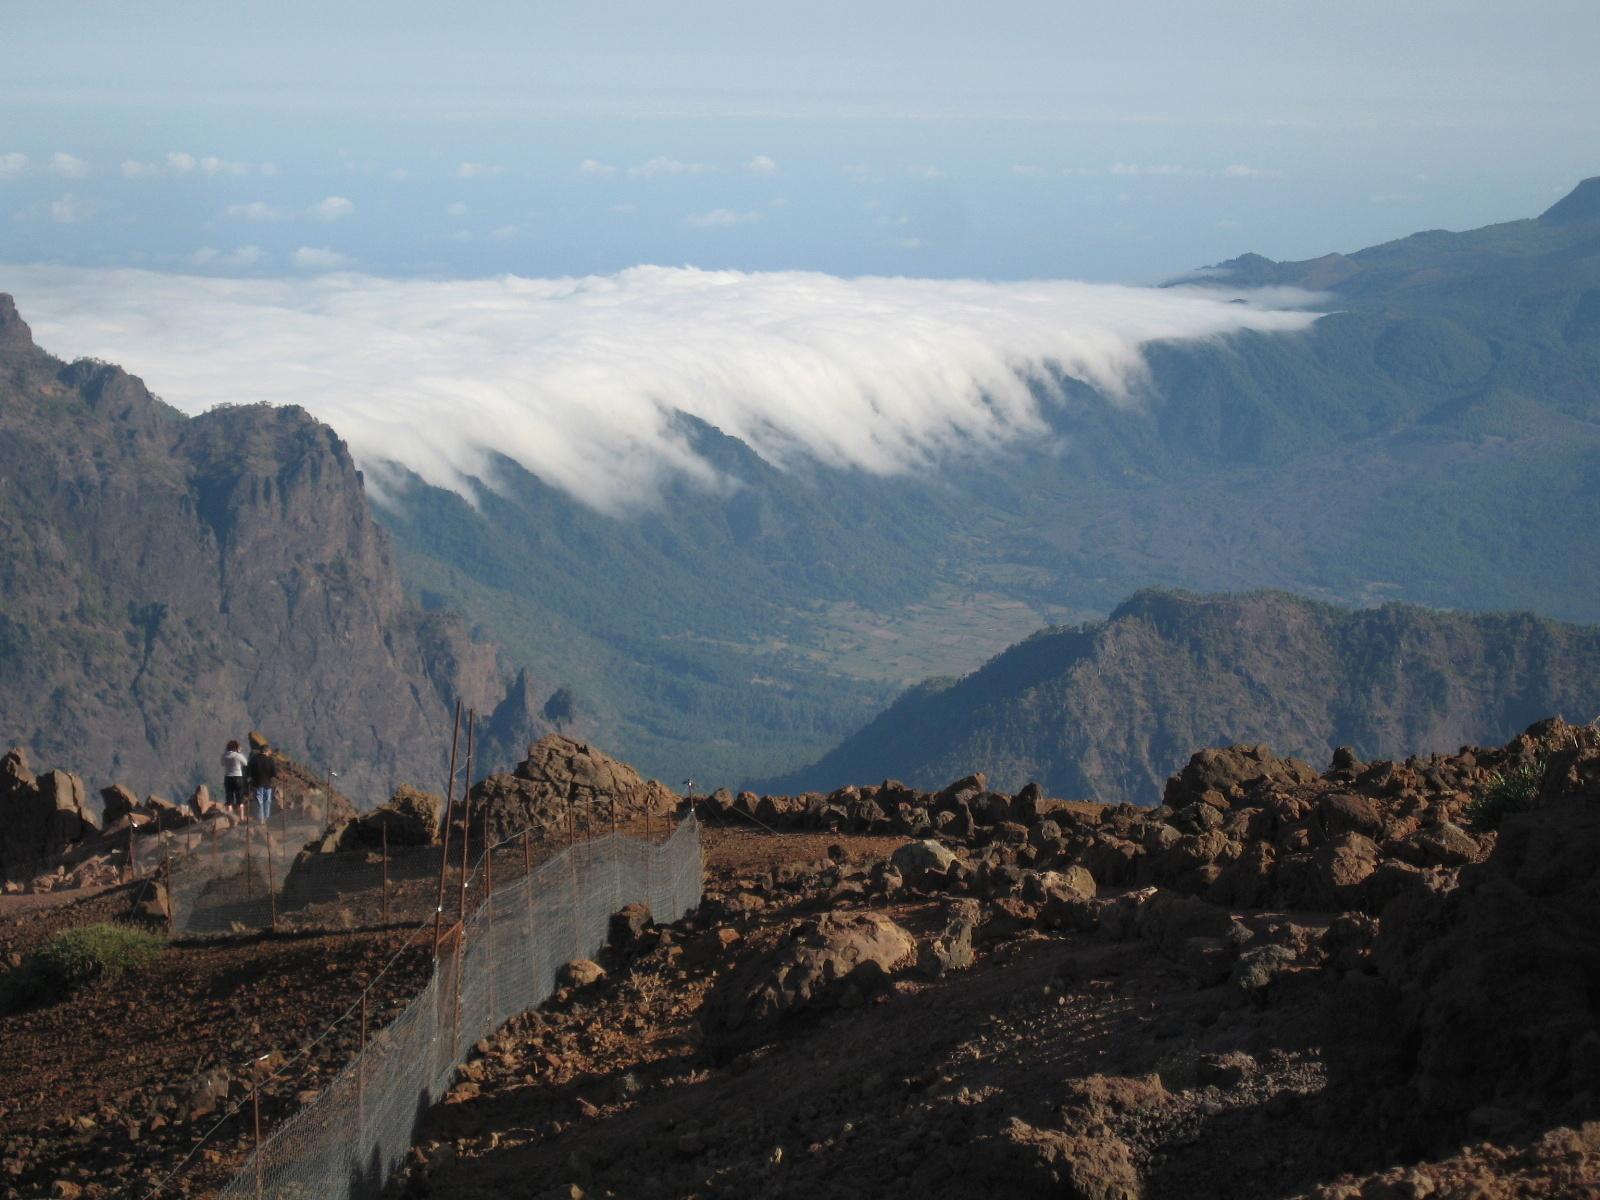 Eruption du volcan Cumbre Vieja - Ile de Palma - Canaries 07091210